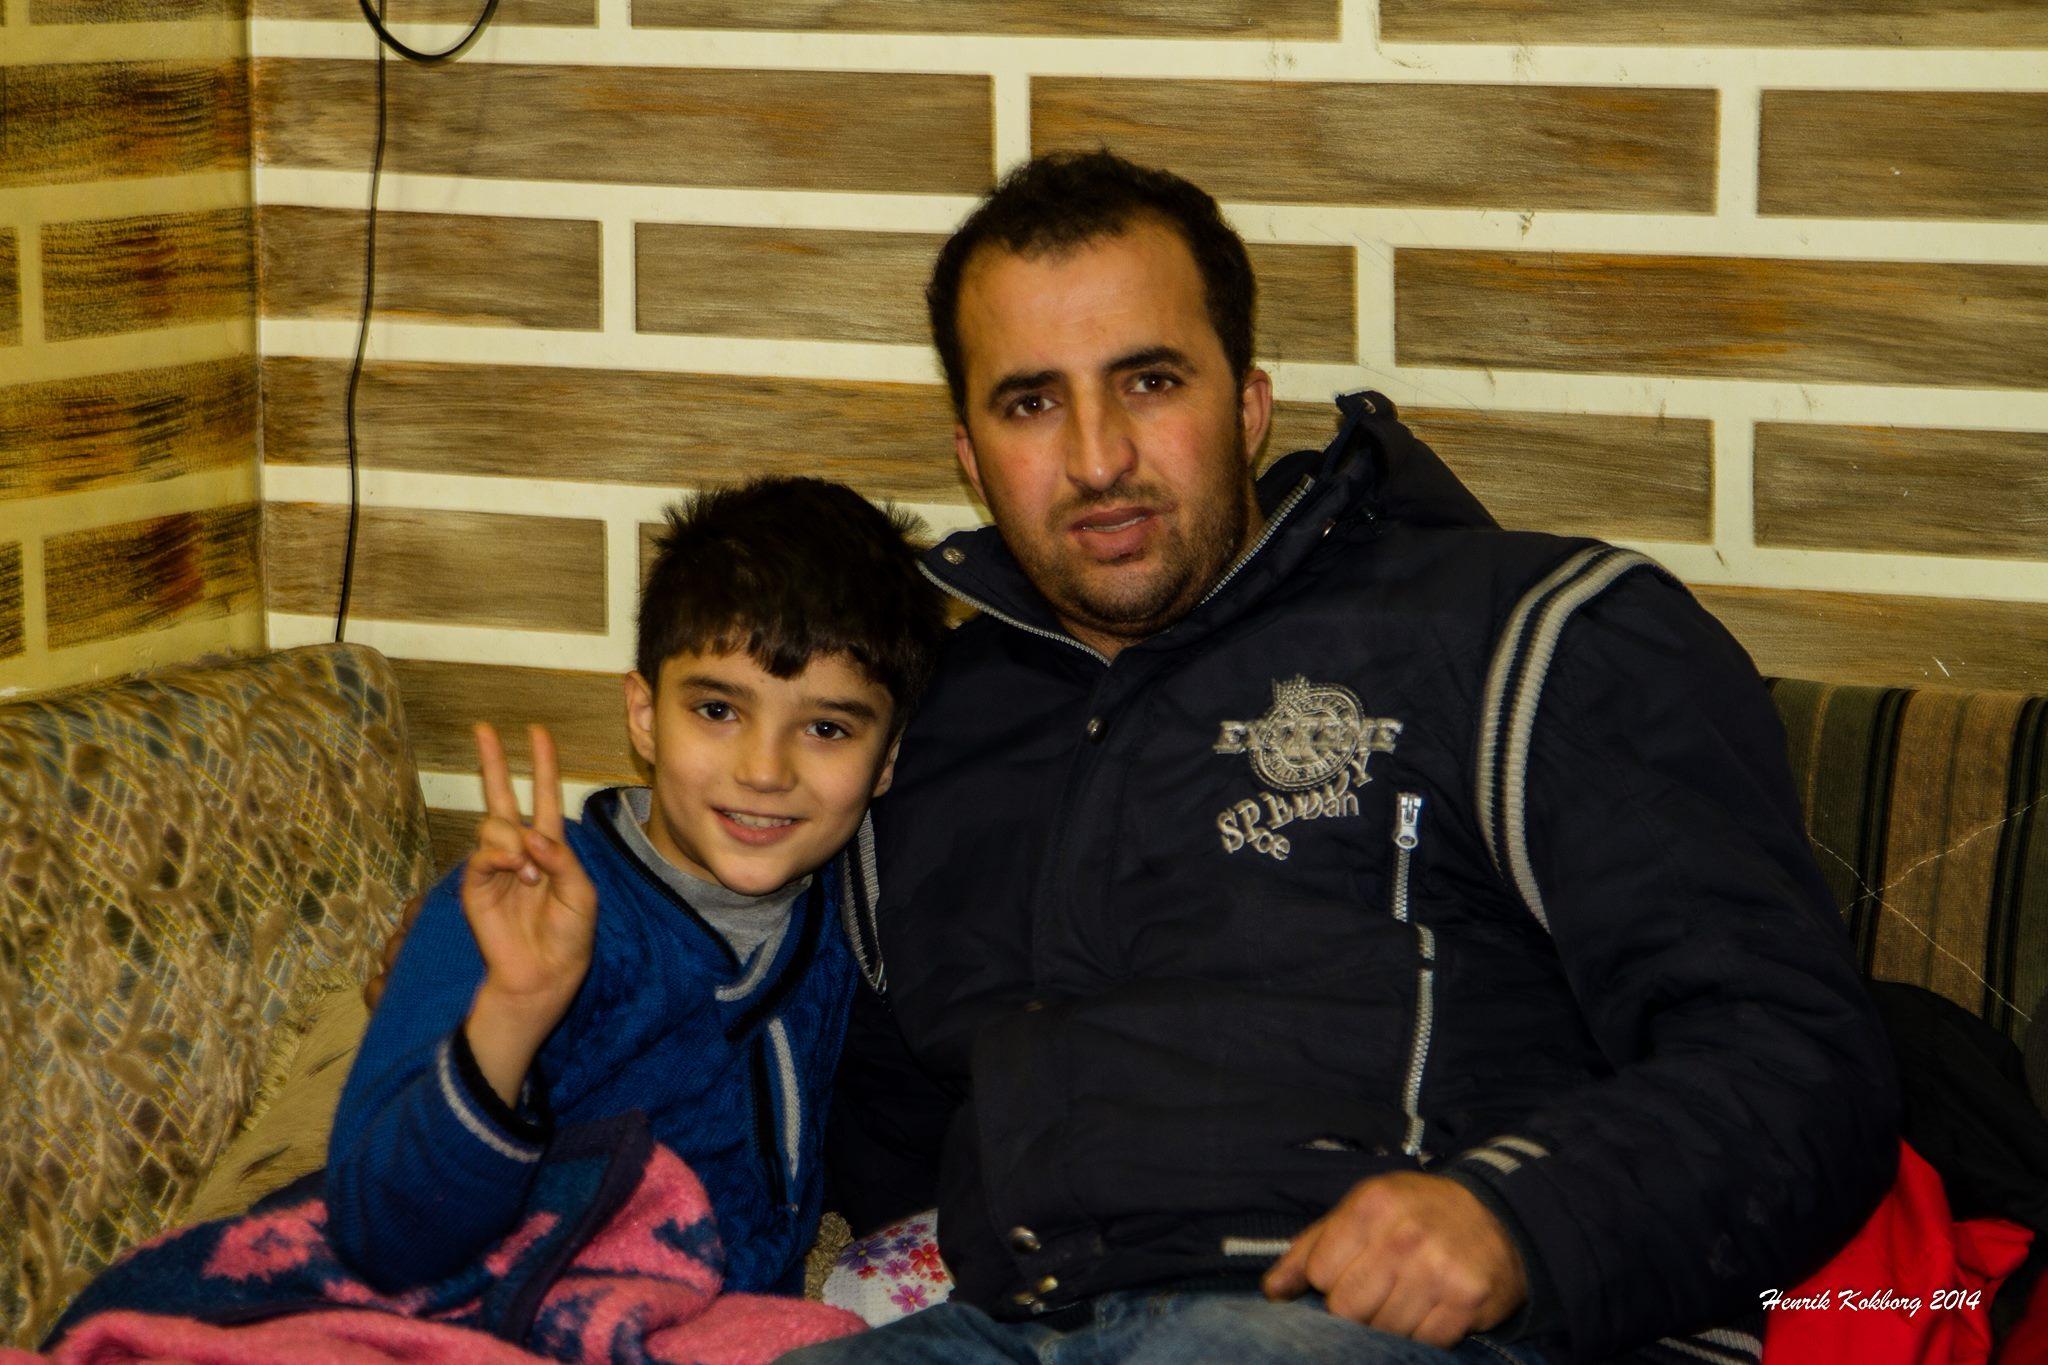 Mohammed, et syrisk flygtninge barn. 9. januar 2014